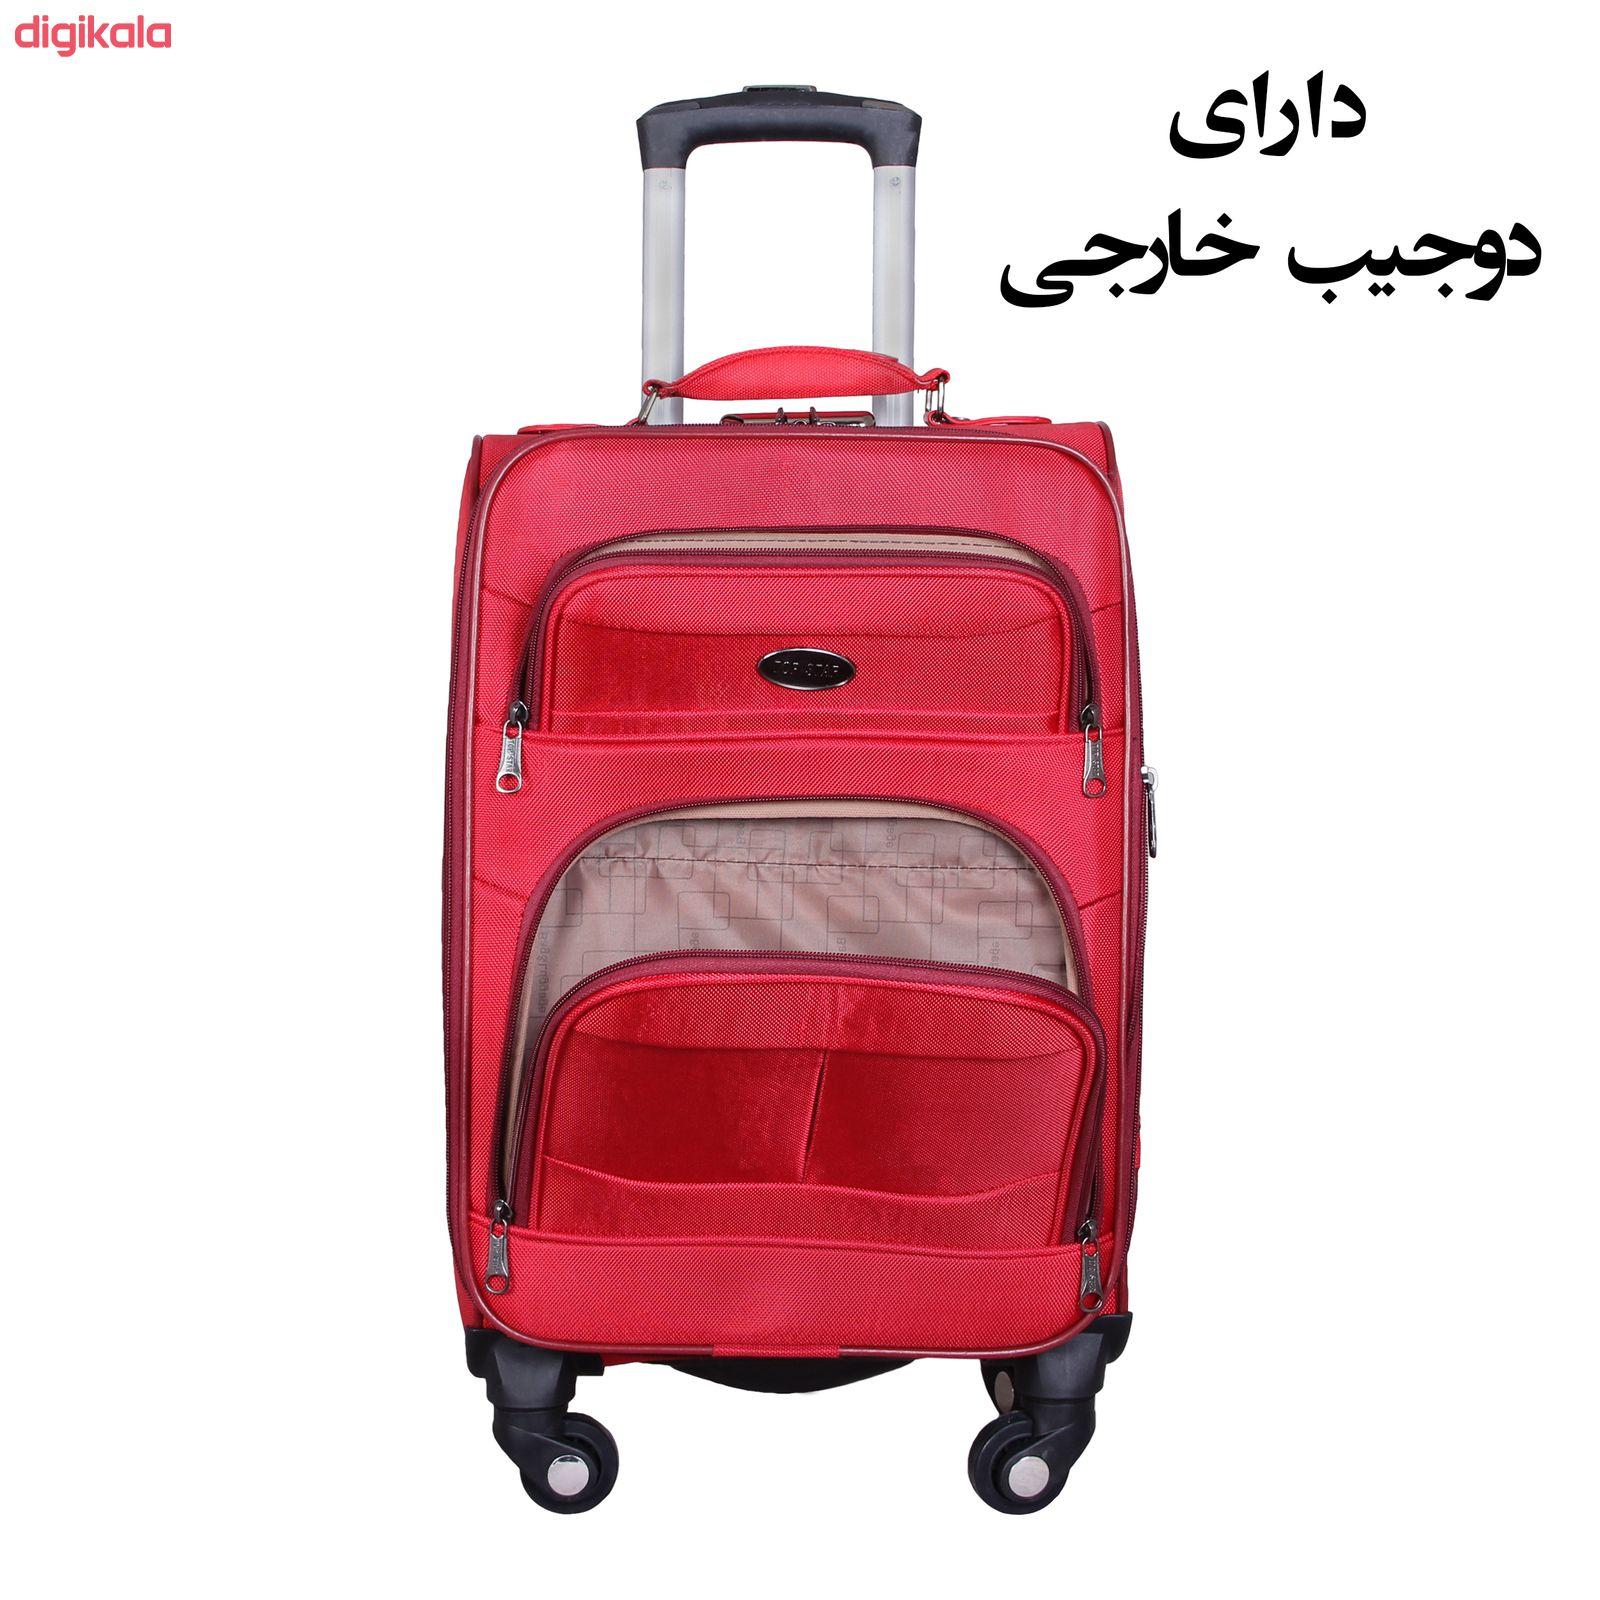 مجموعه سه عددی چمدان کدA1034 main 1 12